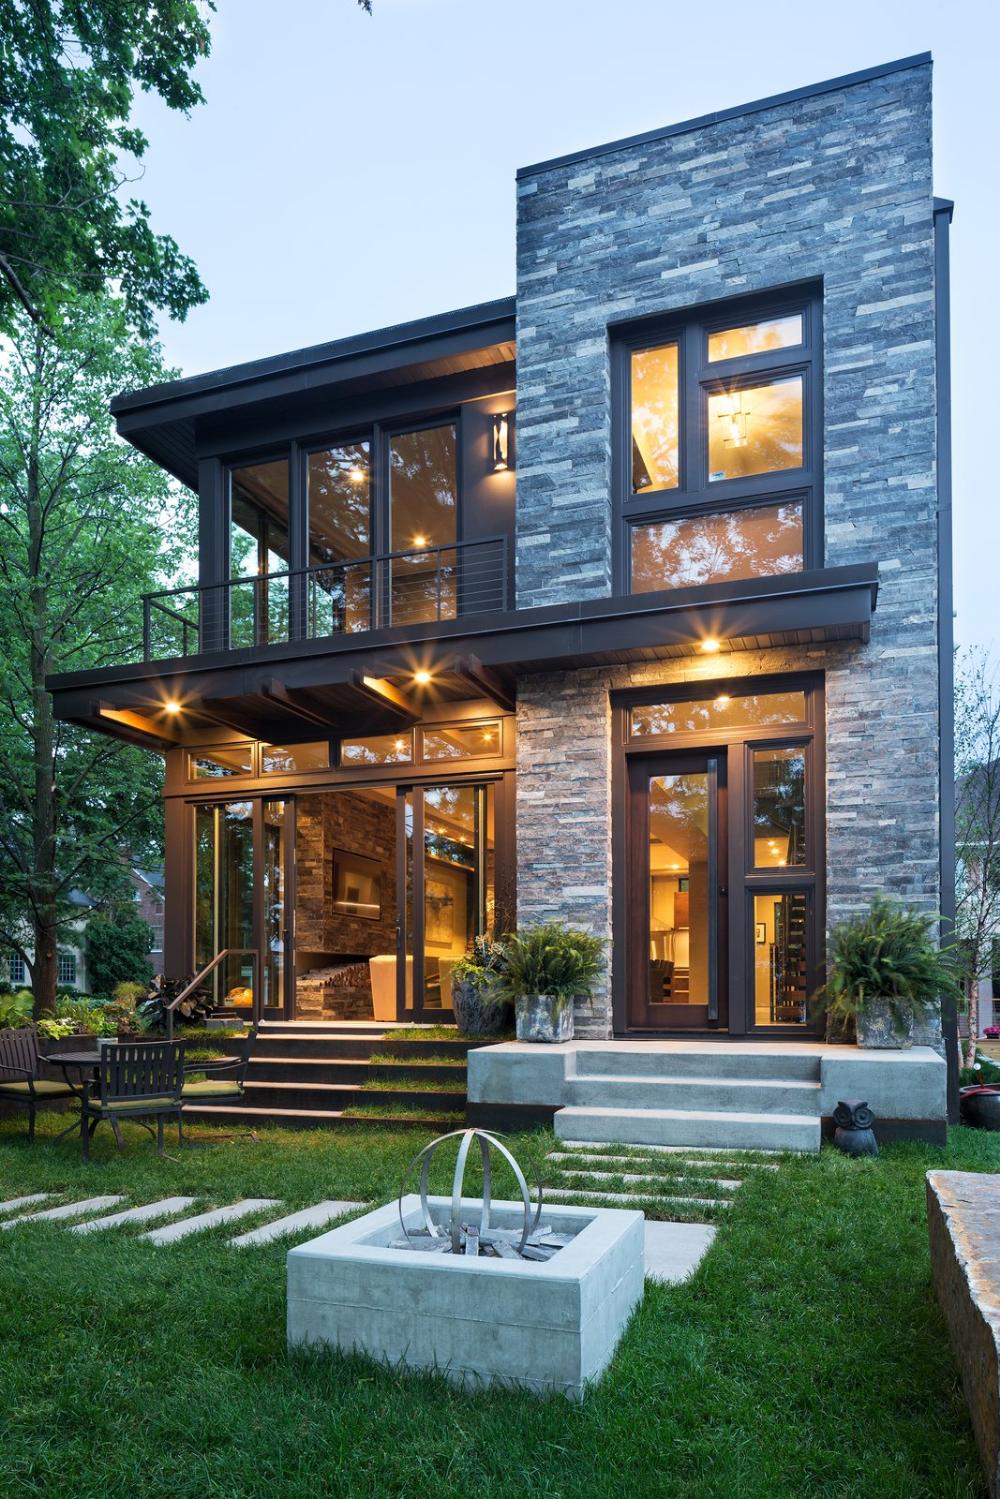 Modern Organic Home By John Kraemer Sons In Minneapolis Usa: Lake Calhoun Organic Modern Modern Home In Minneapolis Minnesota